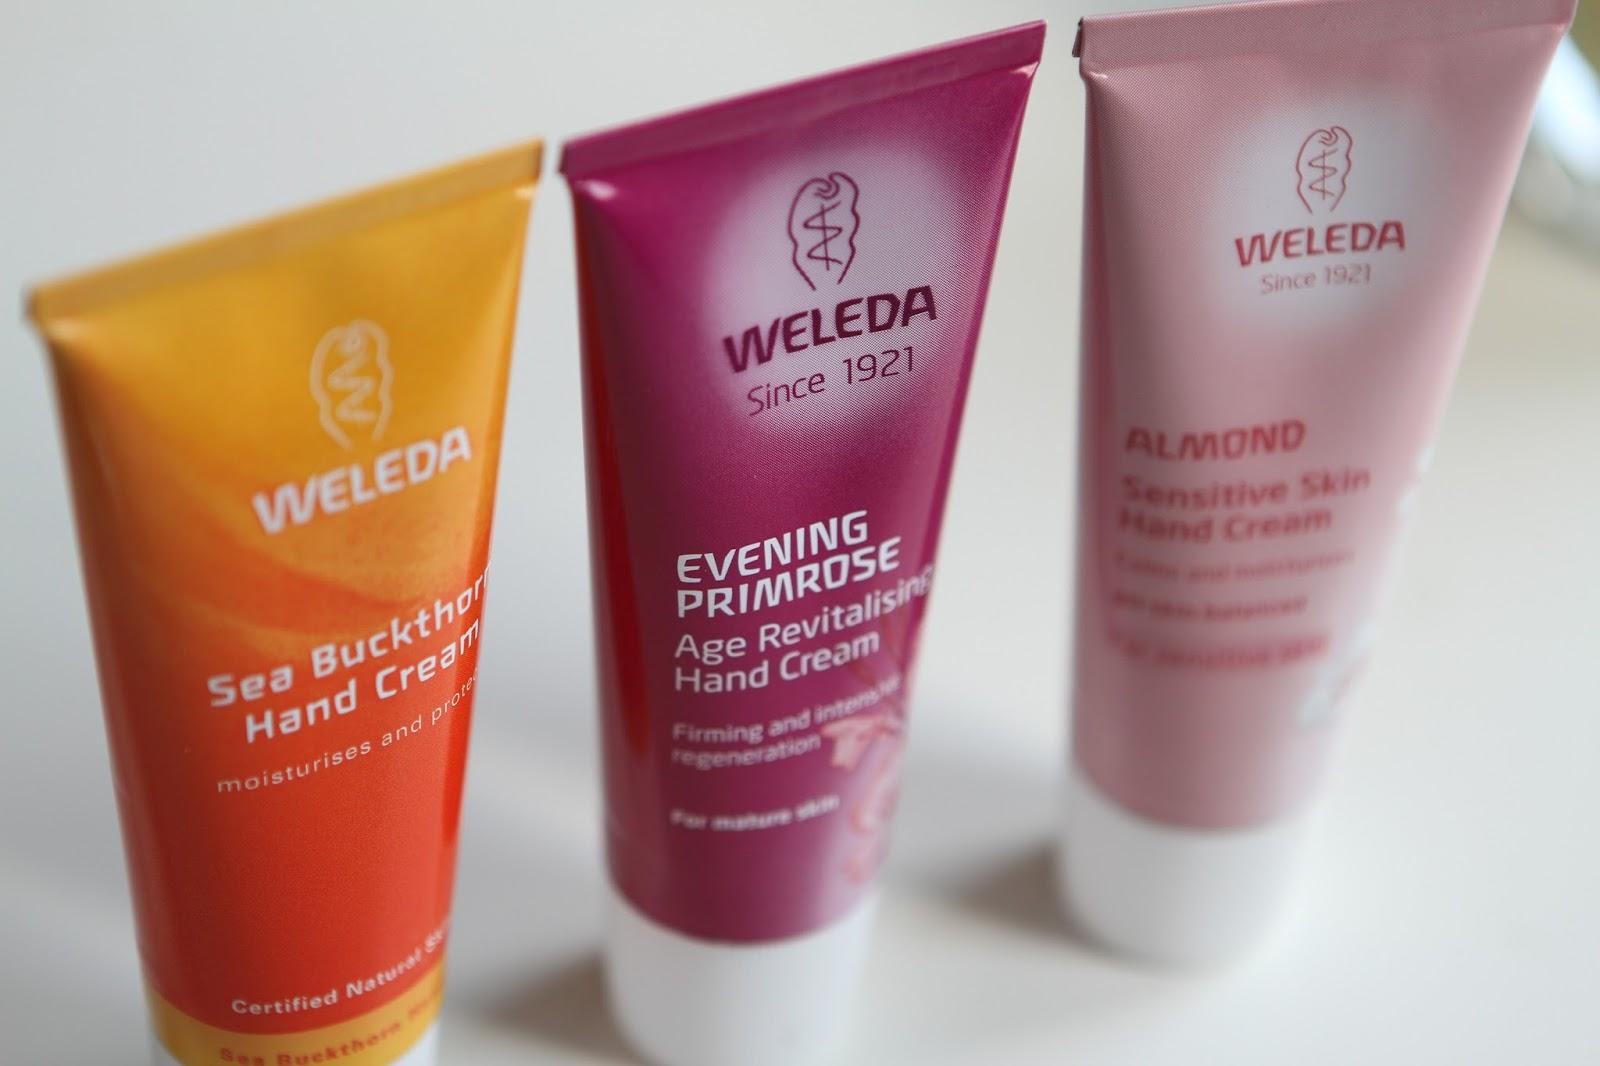 Weleda hand cream trio]